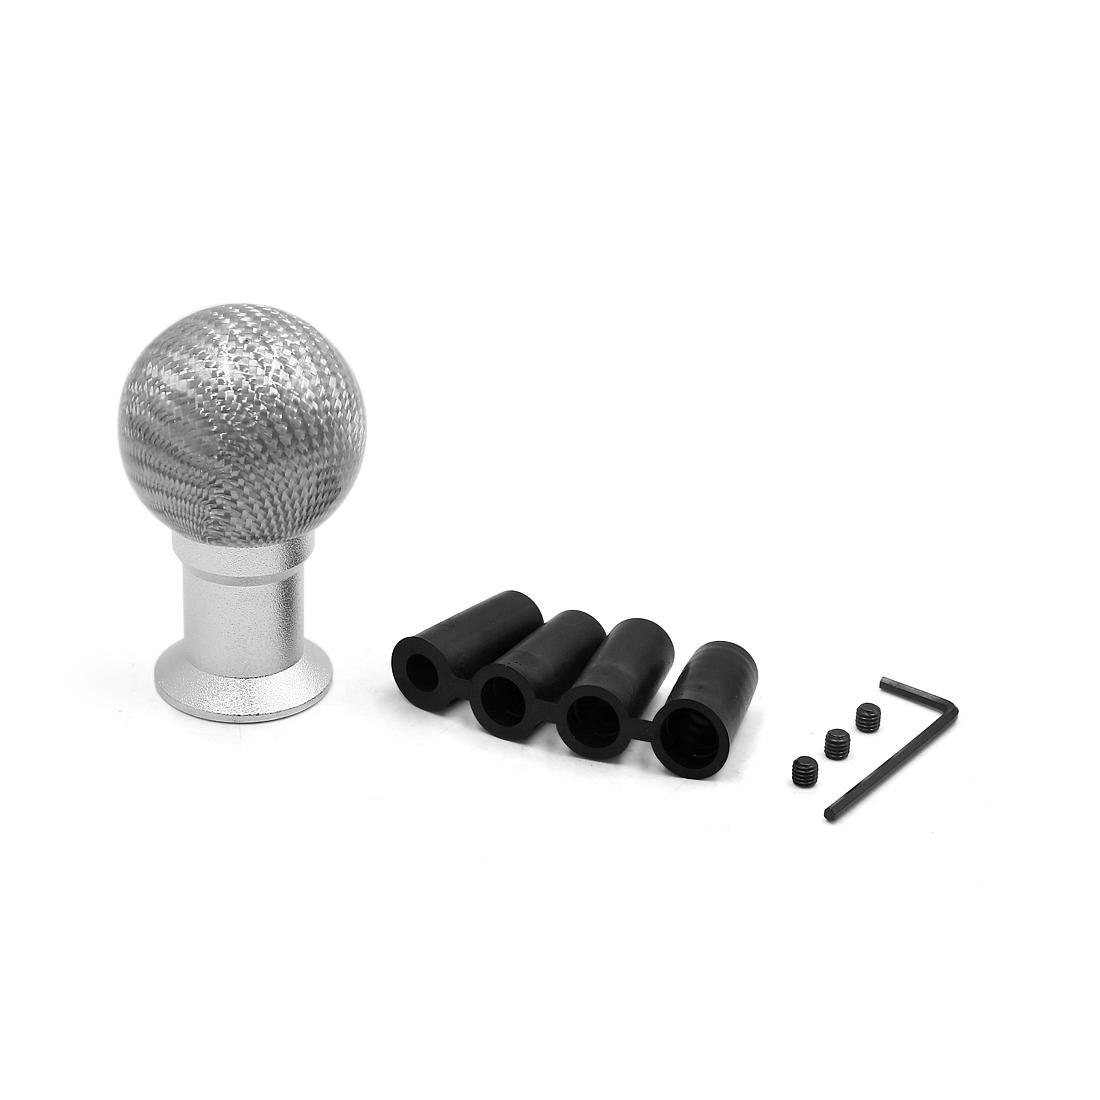 Silver Tone Carbon Fiber Pattern Car Manual Gear Shift Shifter Knob w 4 Adapter